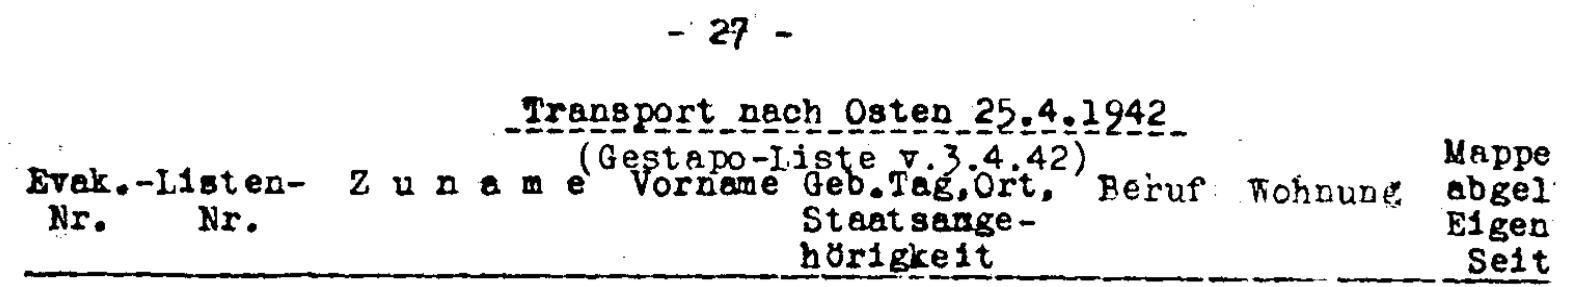 Guthmann, Lothar-1